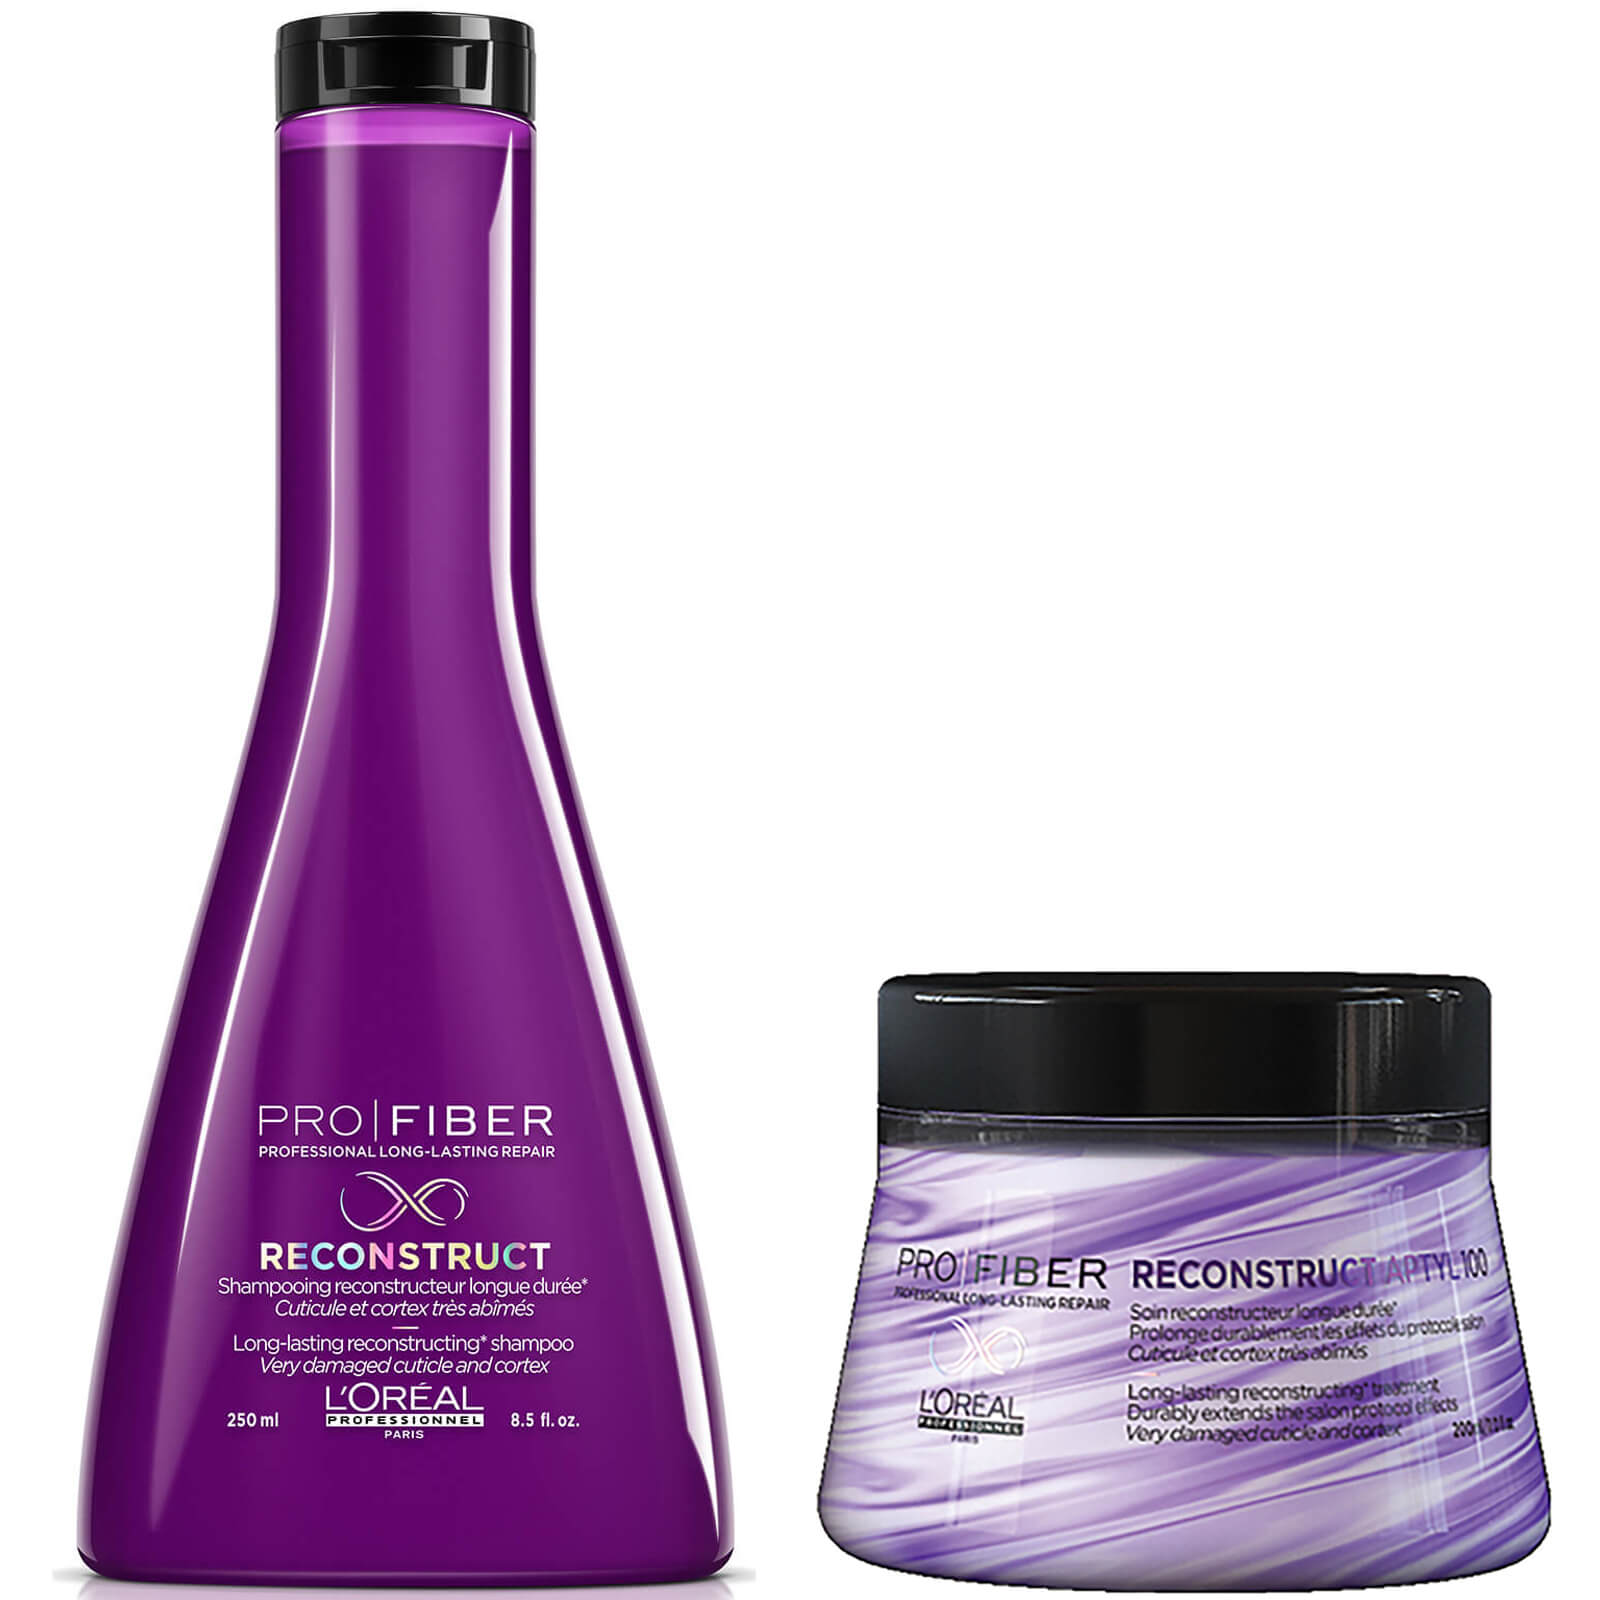 L'Oreal Paris - L'Oreal Professionnel Pro Fiber Reconstruct Very Damaged Hair Shampoo 250ml